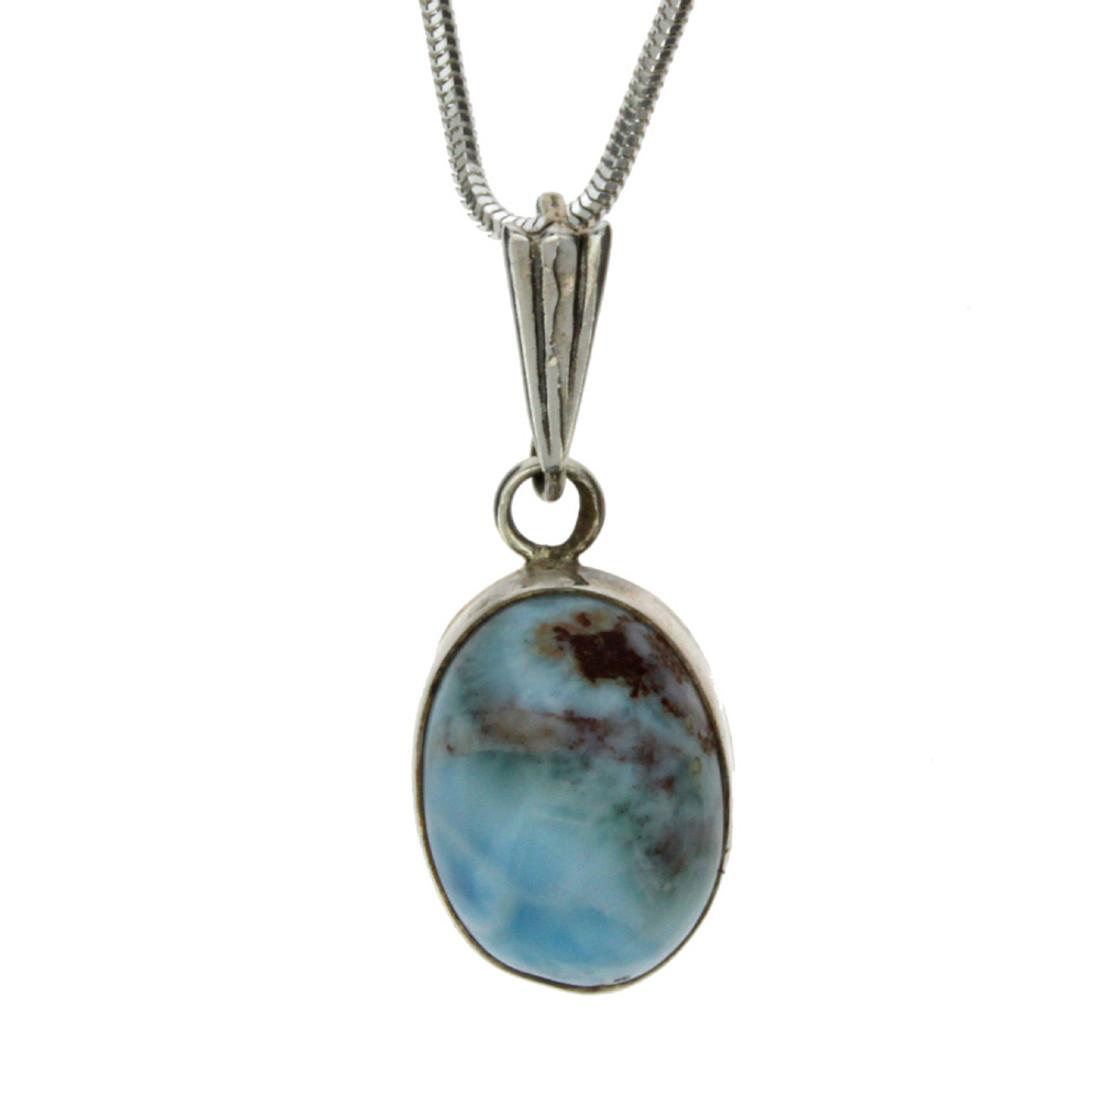 Small oval Larimar pendant.